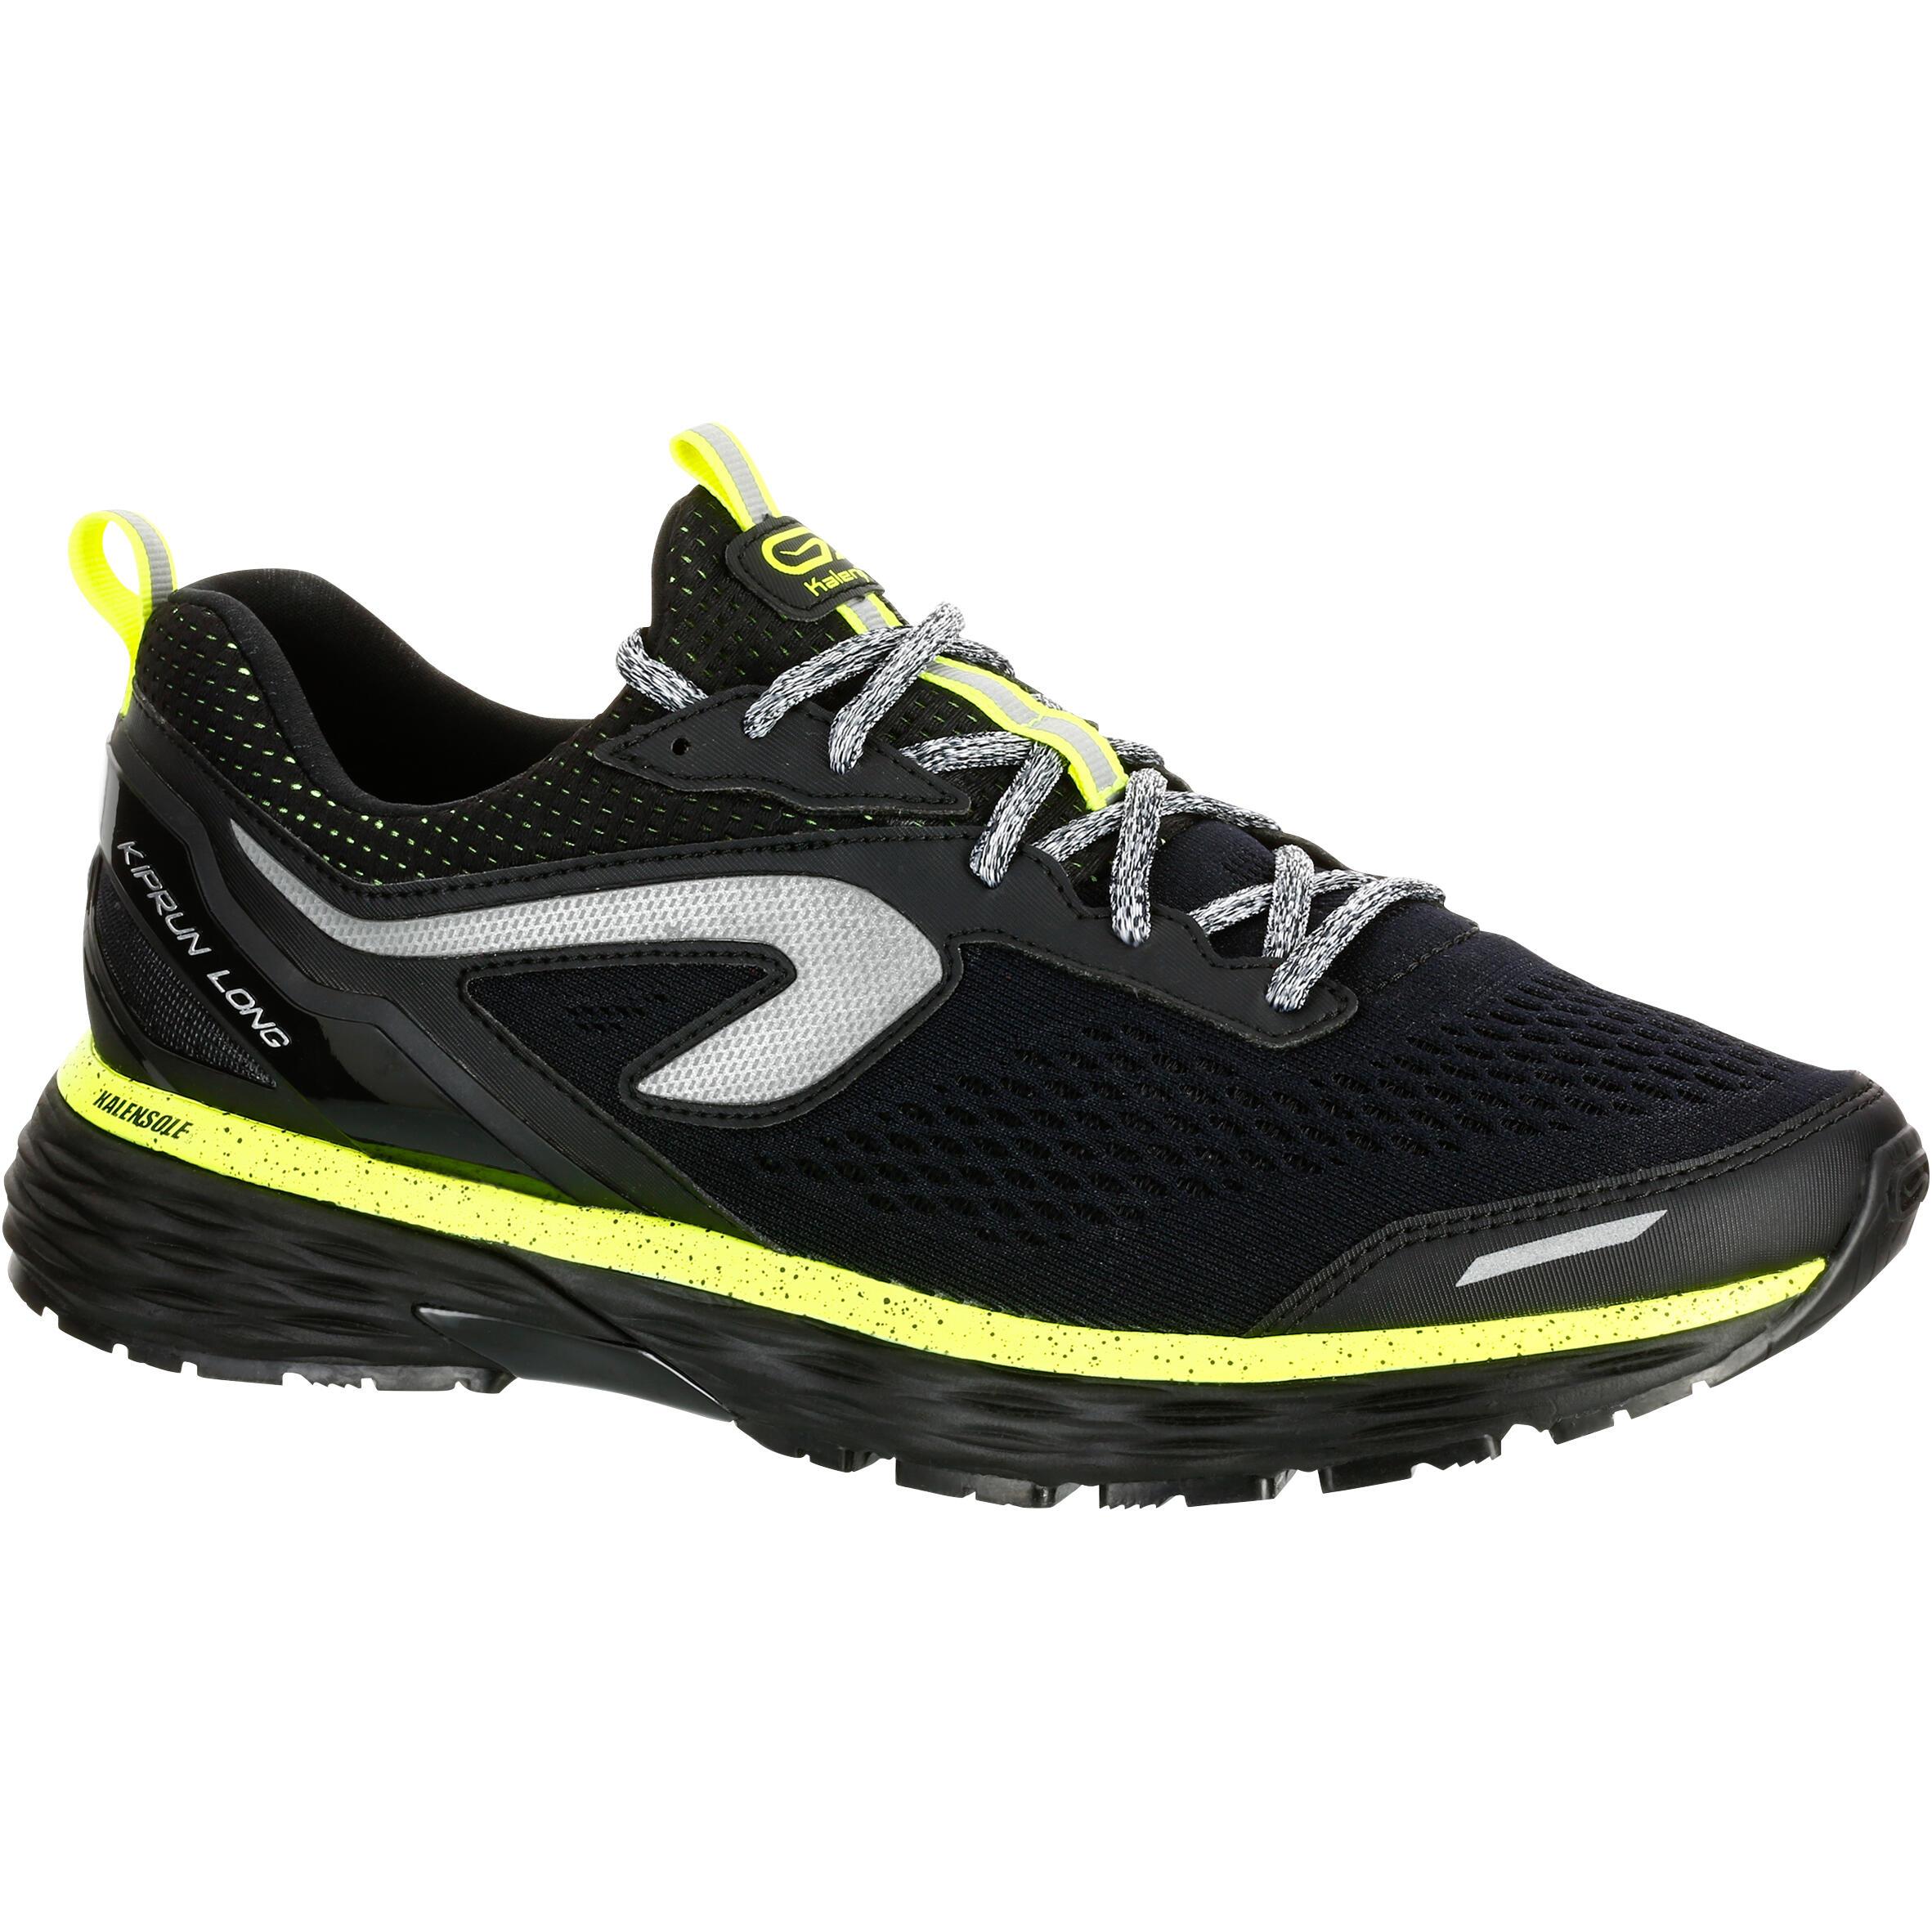 6f3d22036106 Running Hommes Chaussures Decathlon Decathlon Chaussures Running Hrp0Hqw6